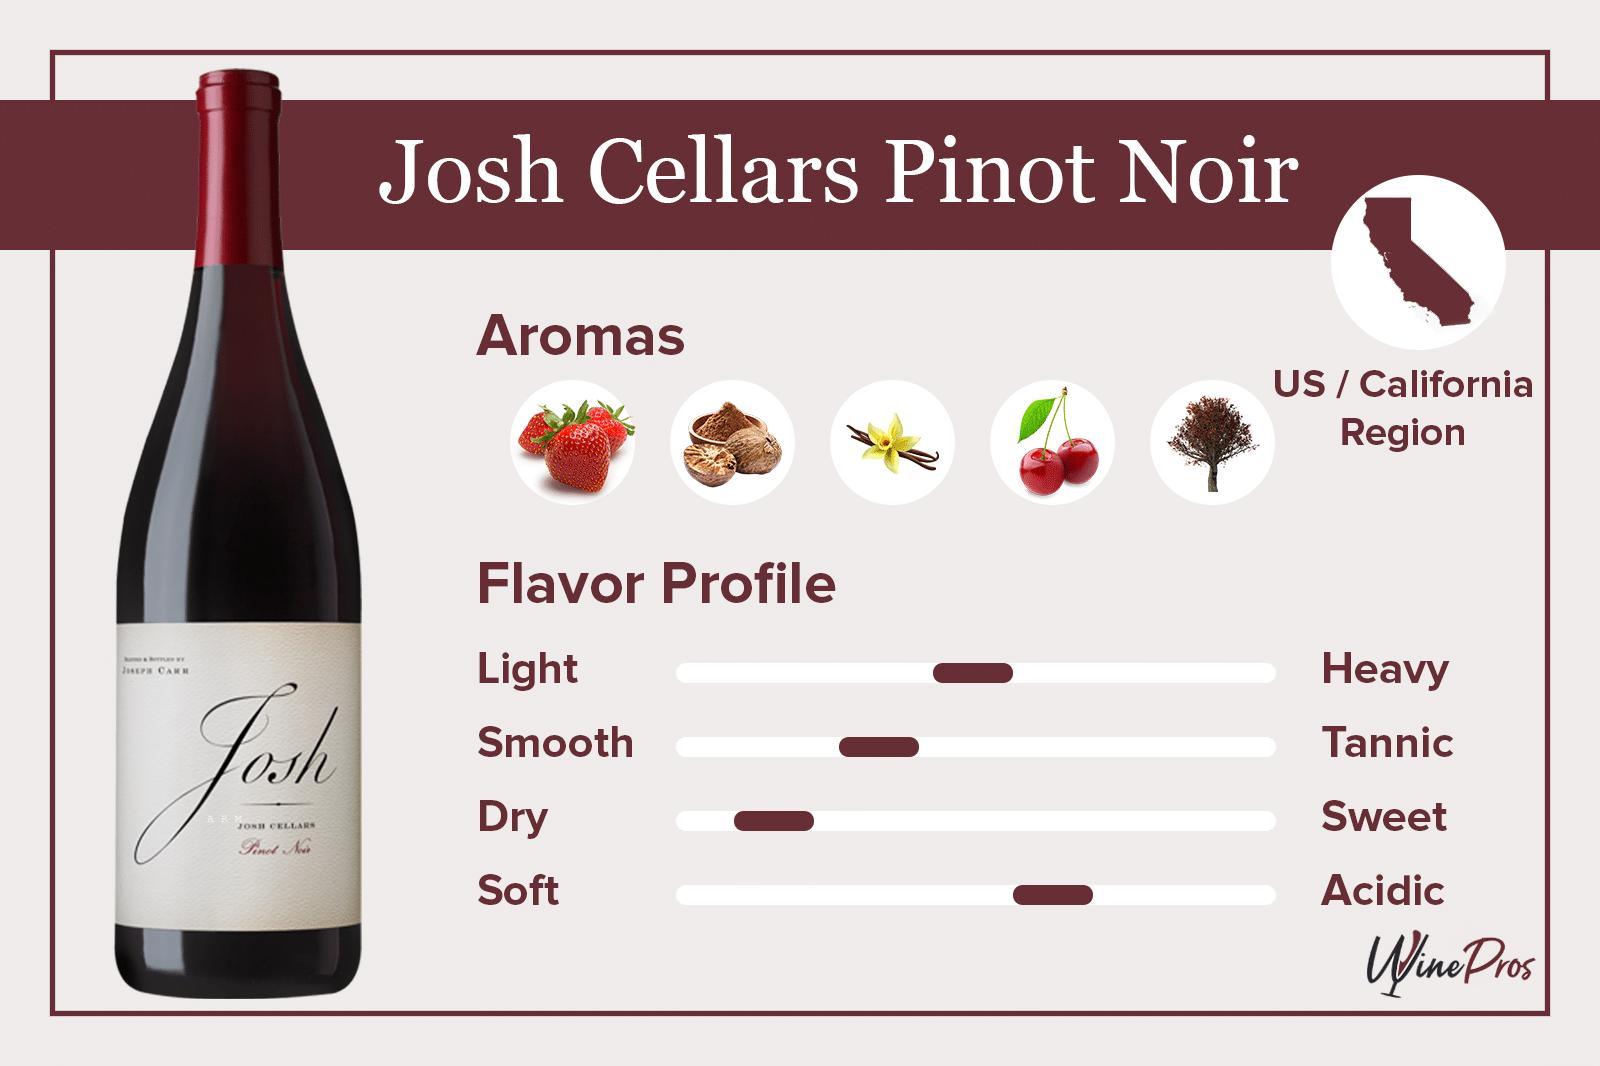 Josh Cellars Pinot Noir Featured